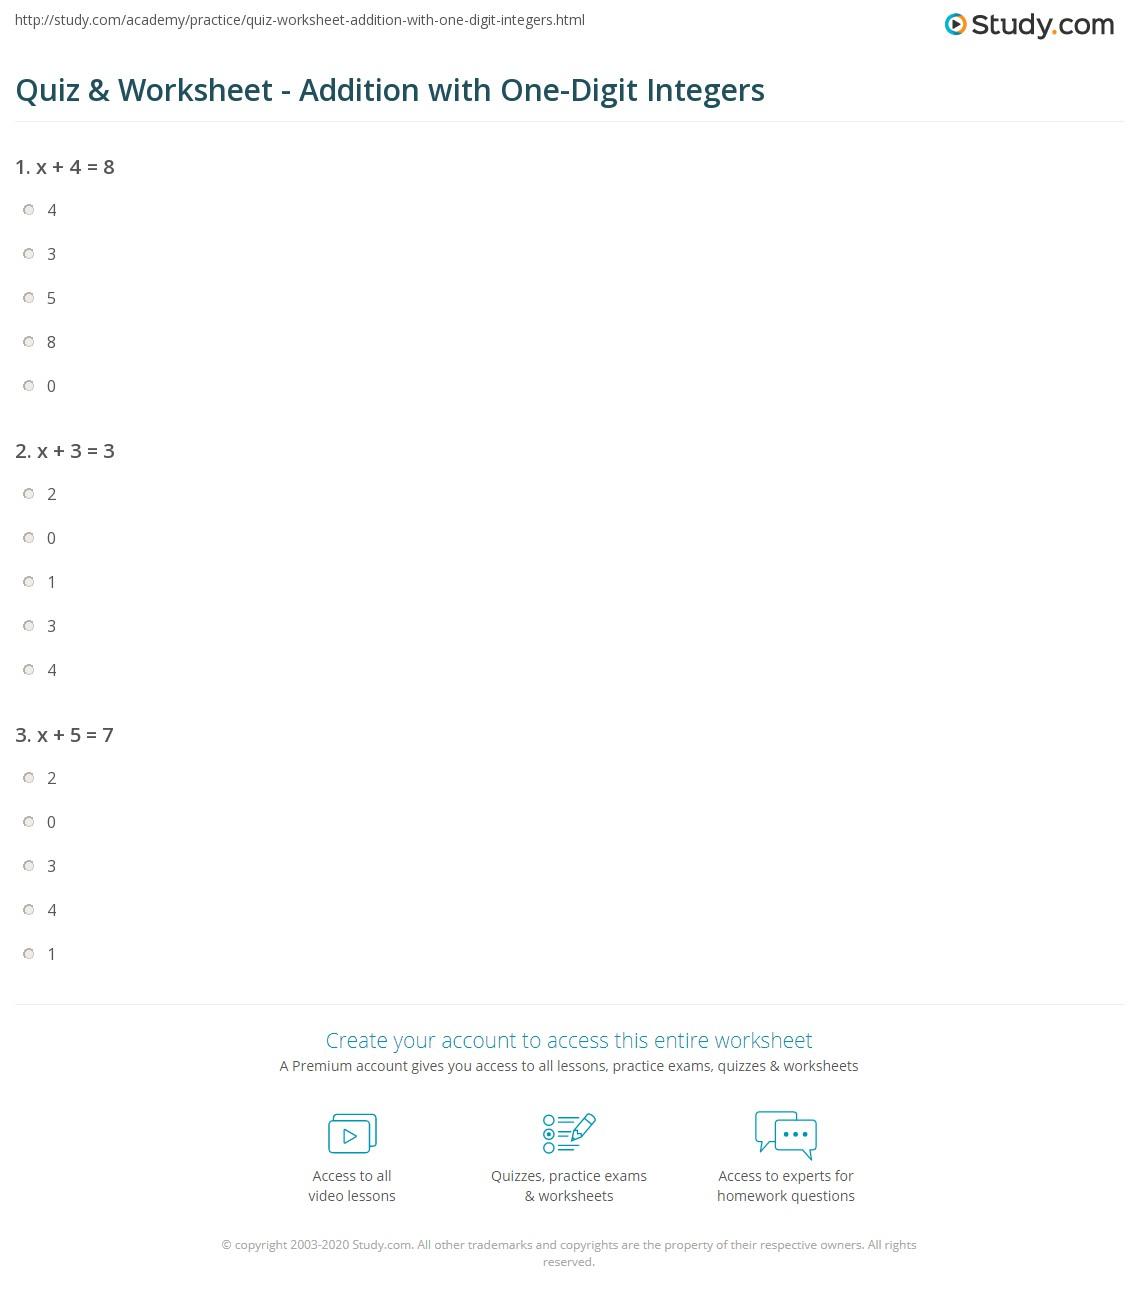 hight resolution of Quiz \u0026 Worksheet - Addition with One-Digit Integers   Study.com